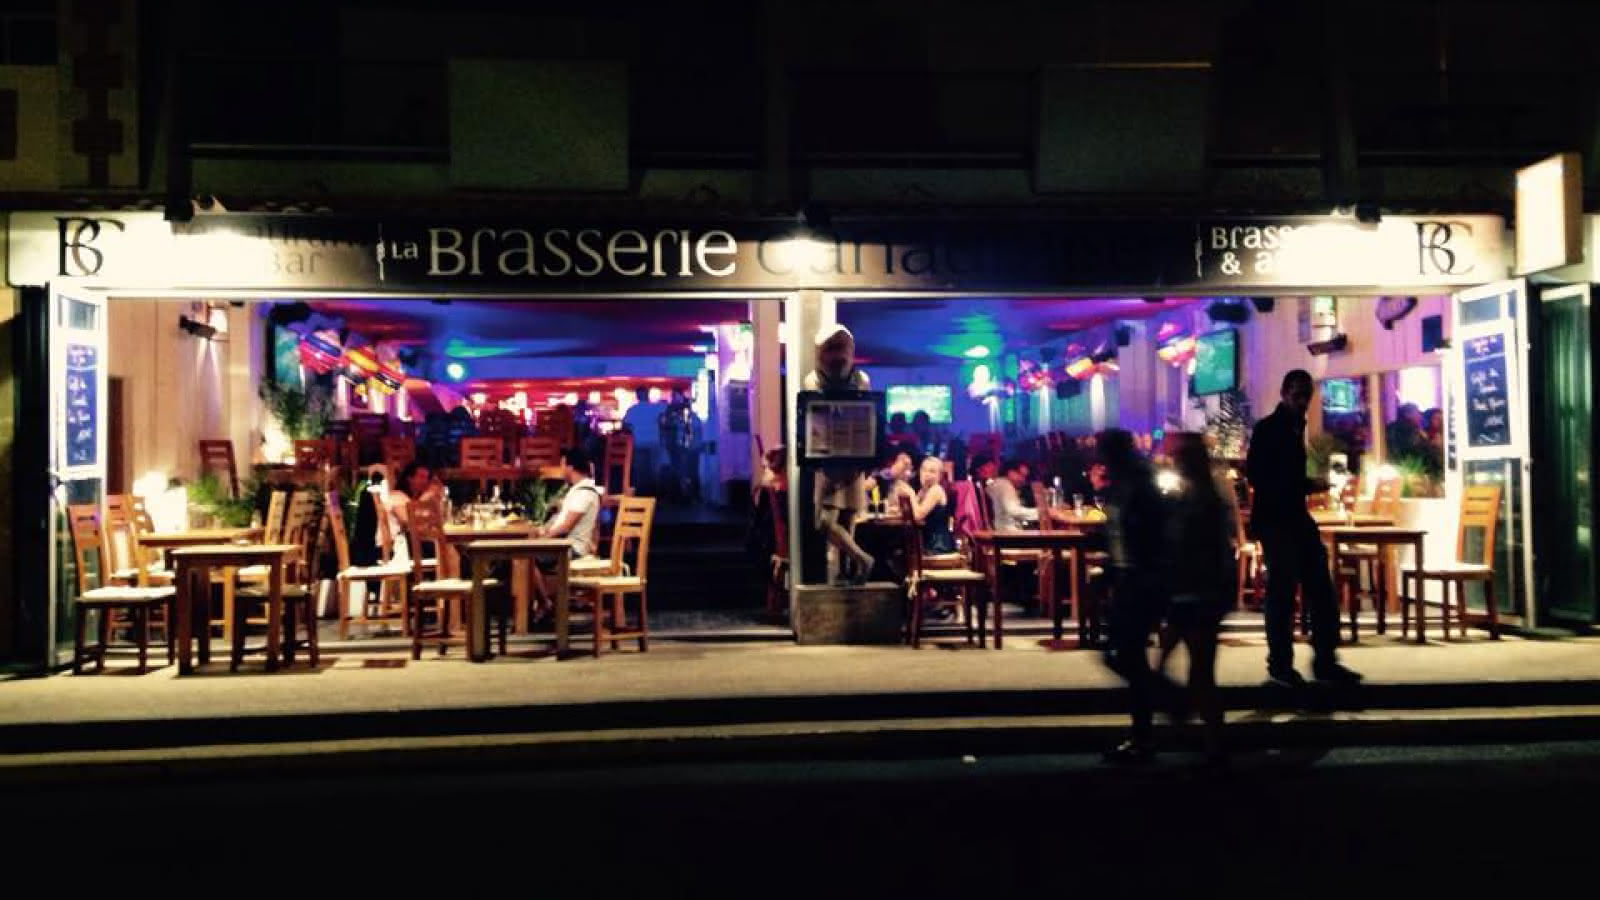 La Brasserie Canaulaise2